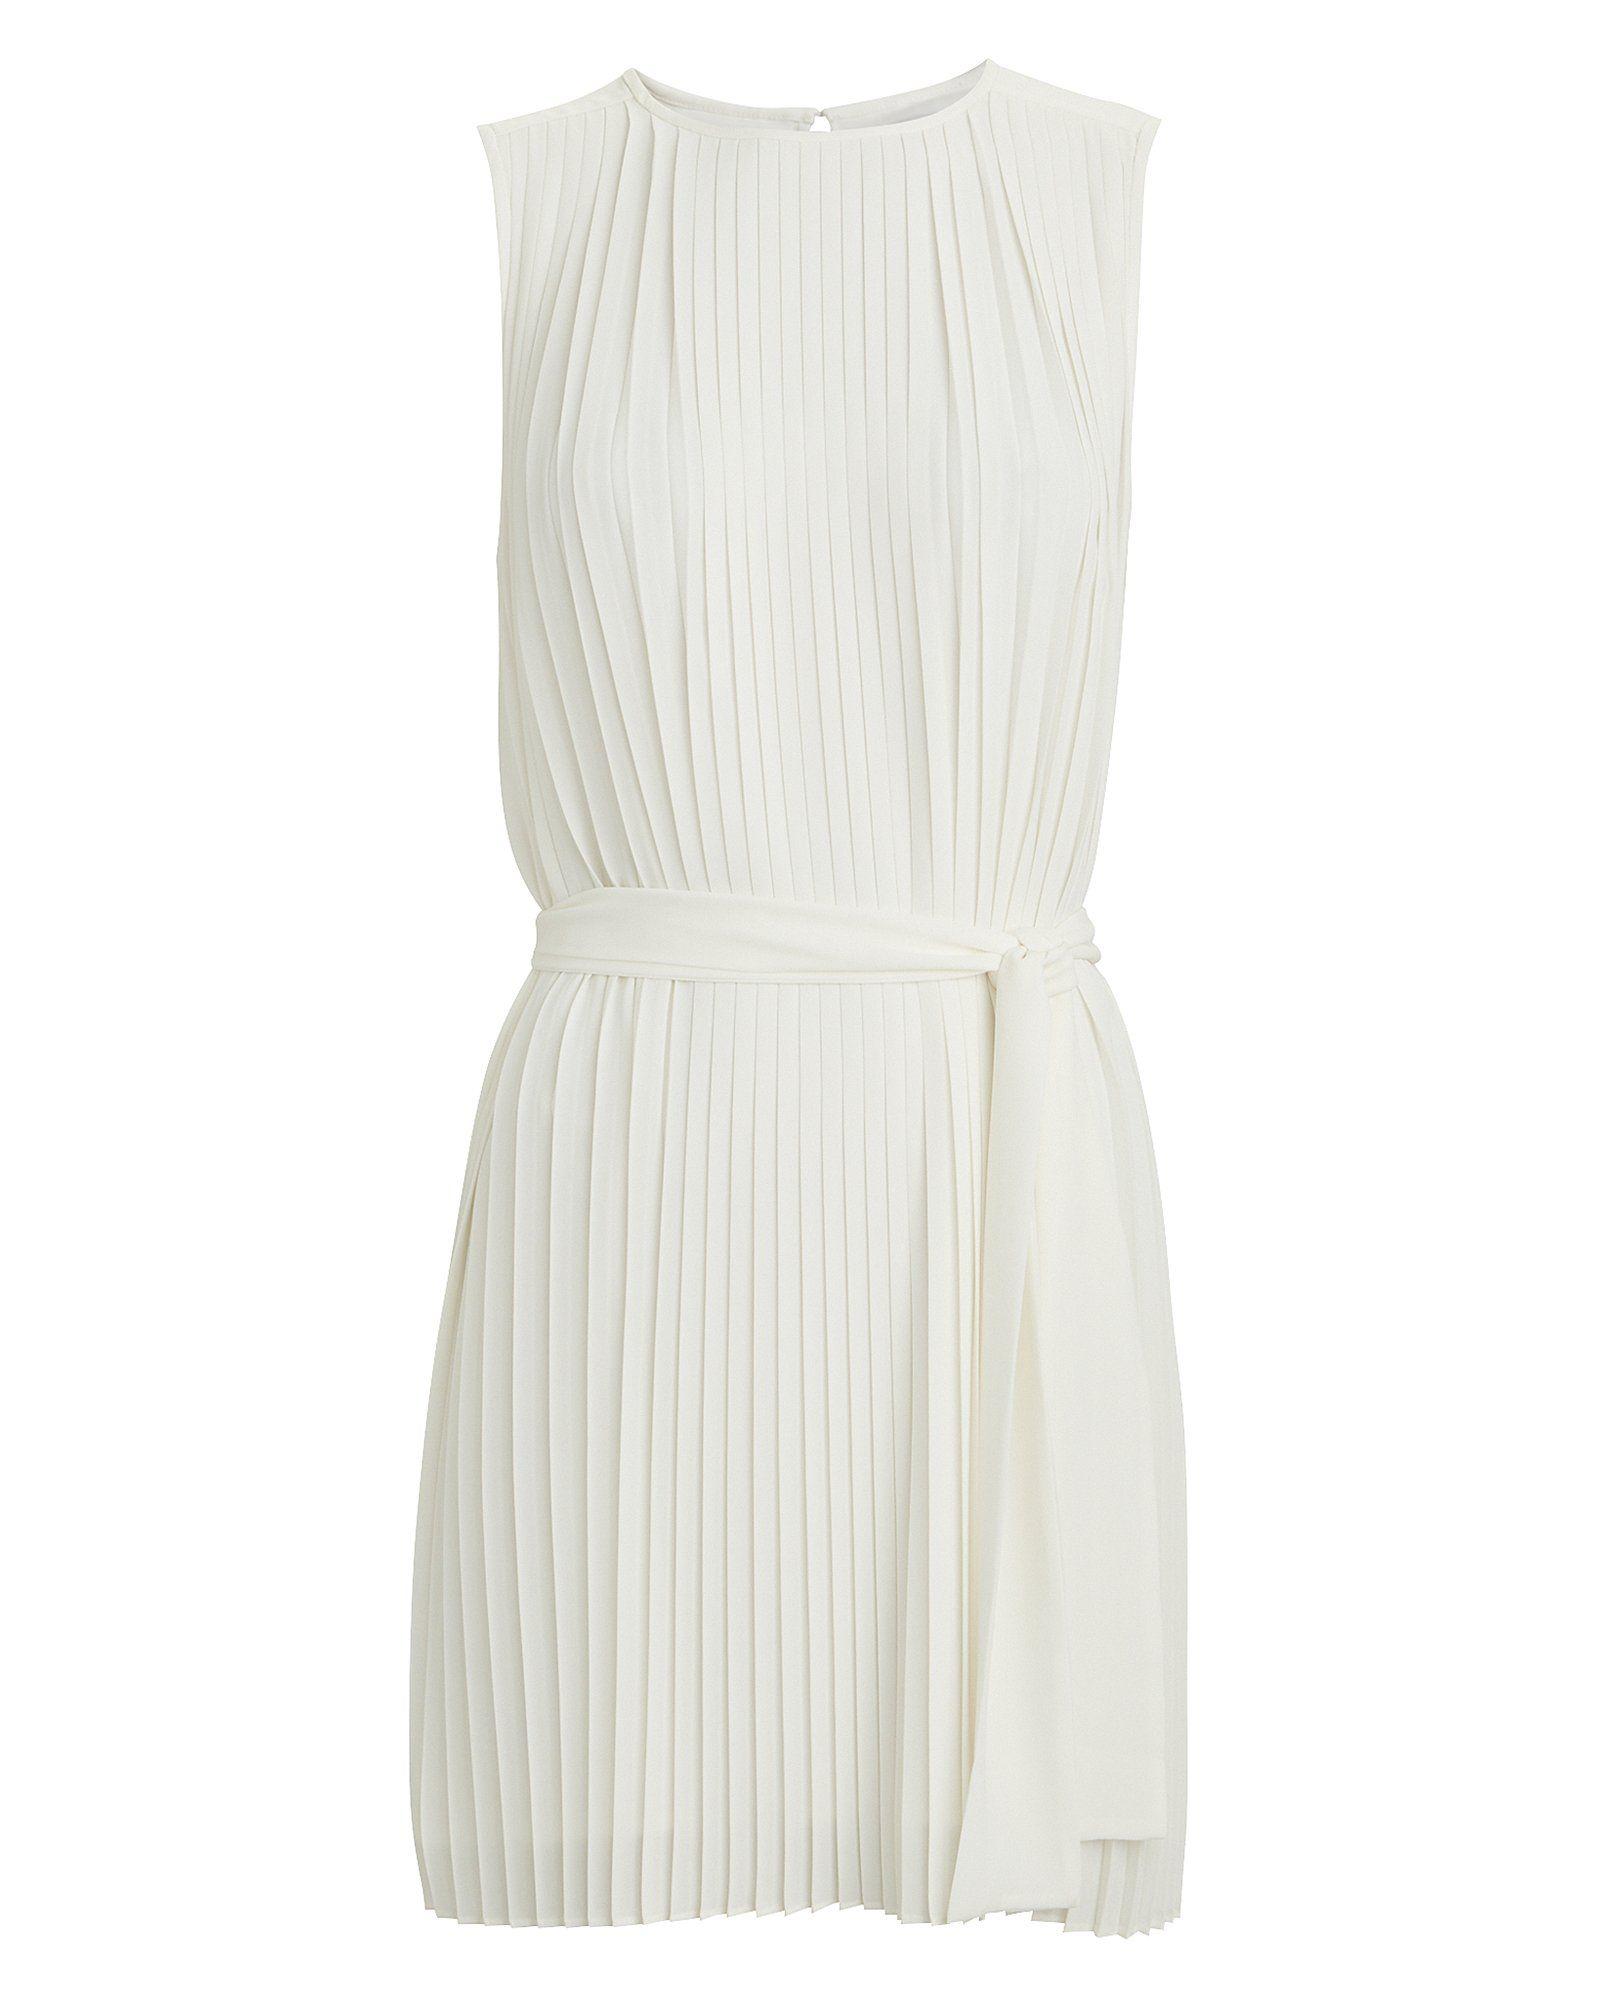 Tilly Pleated Mini Dress Mini Dress White Leather Dress Dresses [ 2000 x 1600 Pixel ]